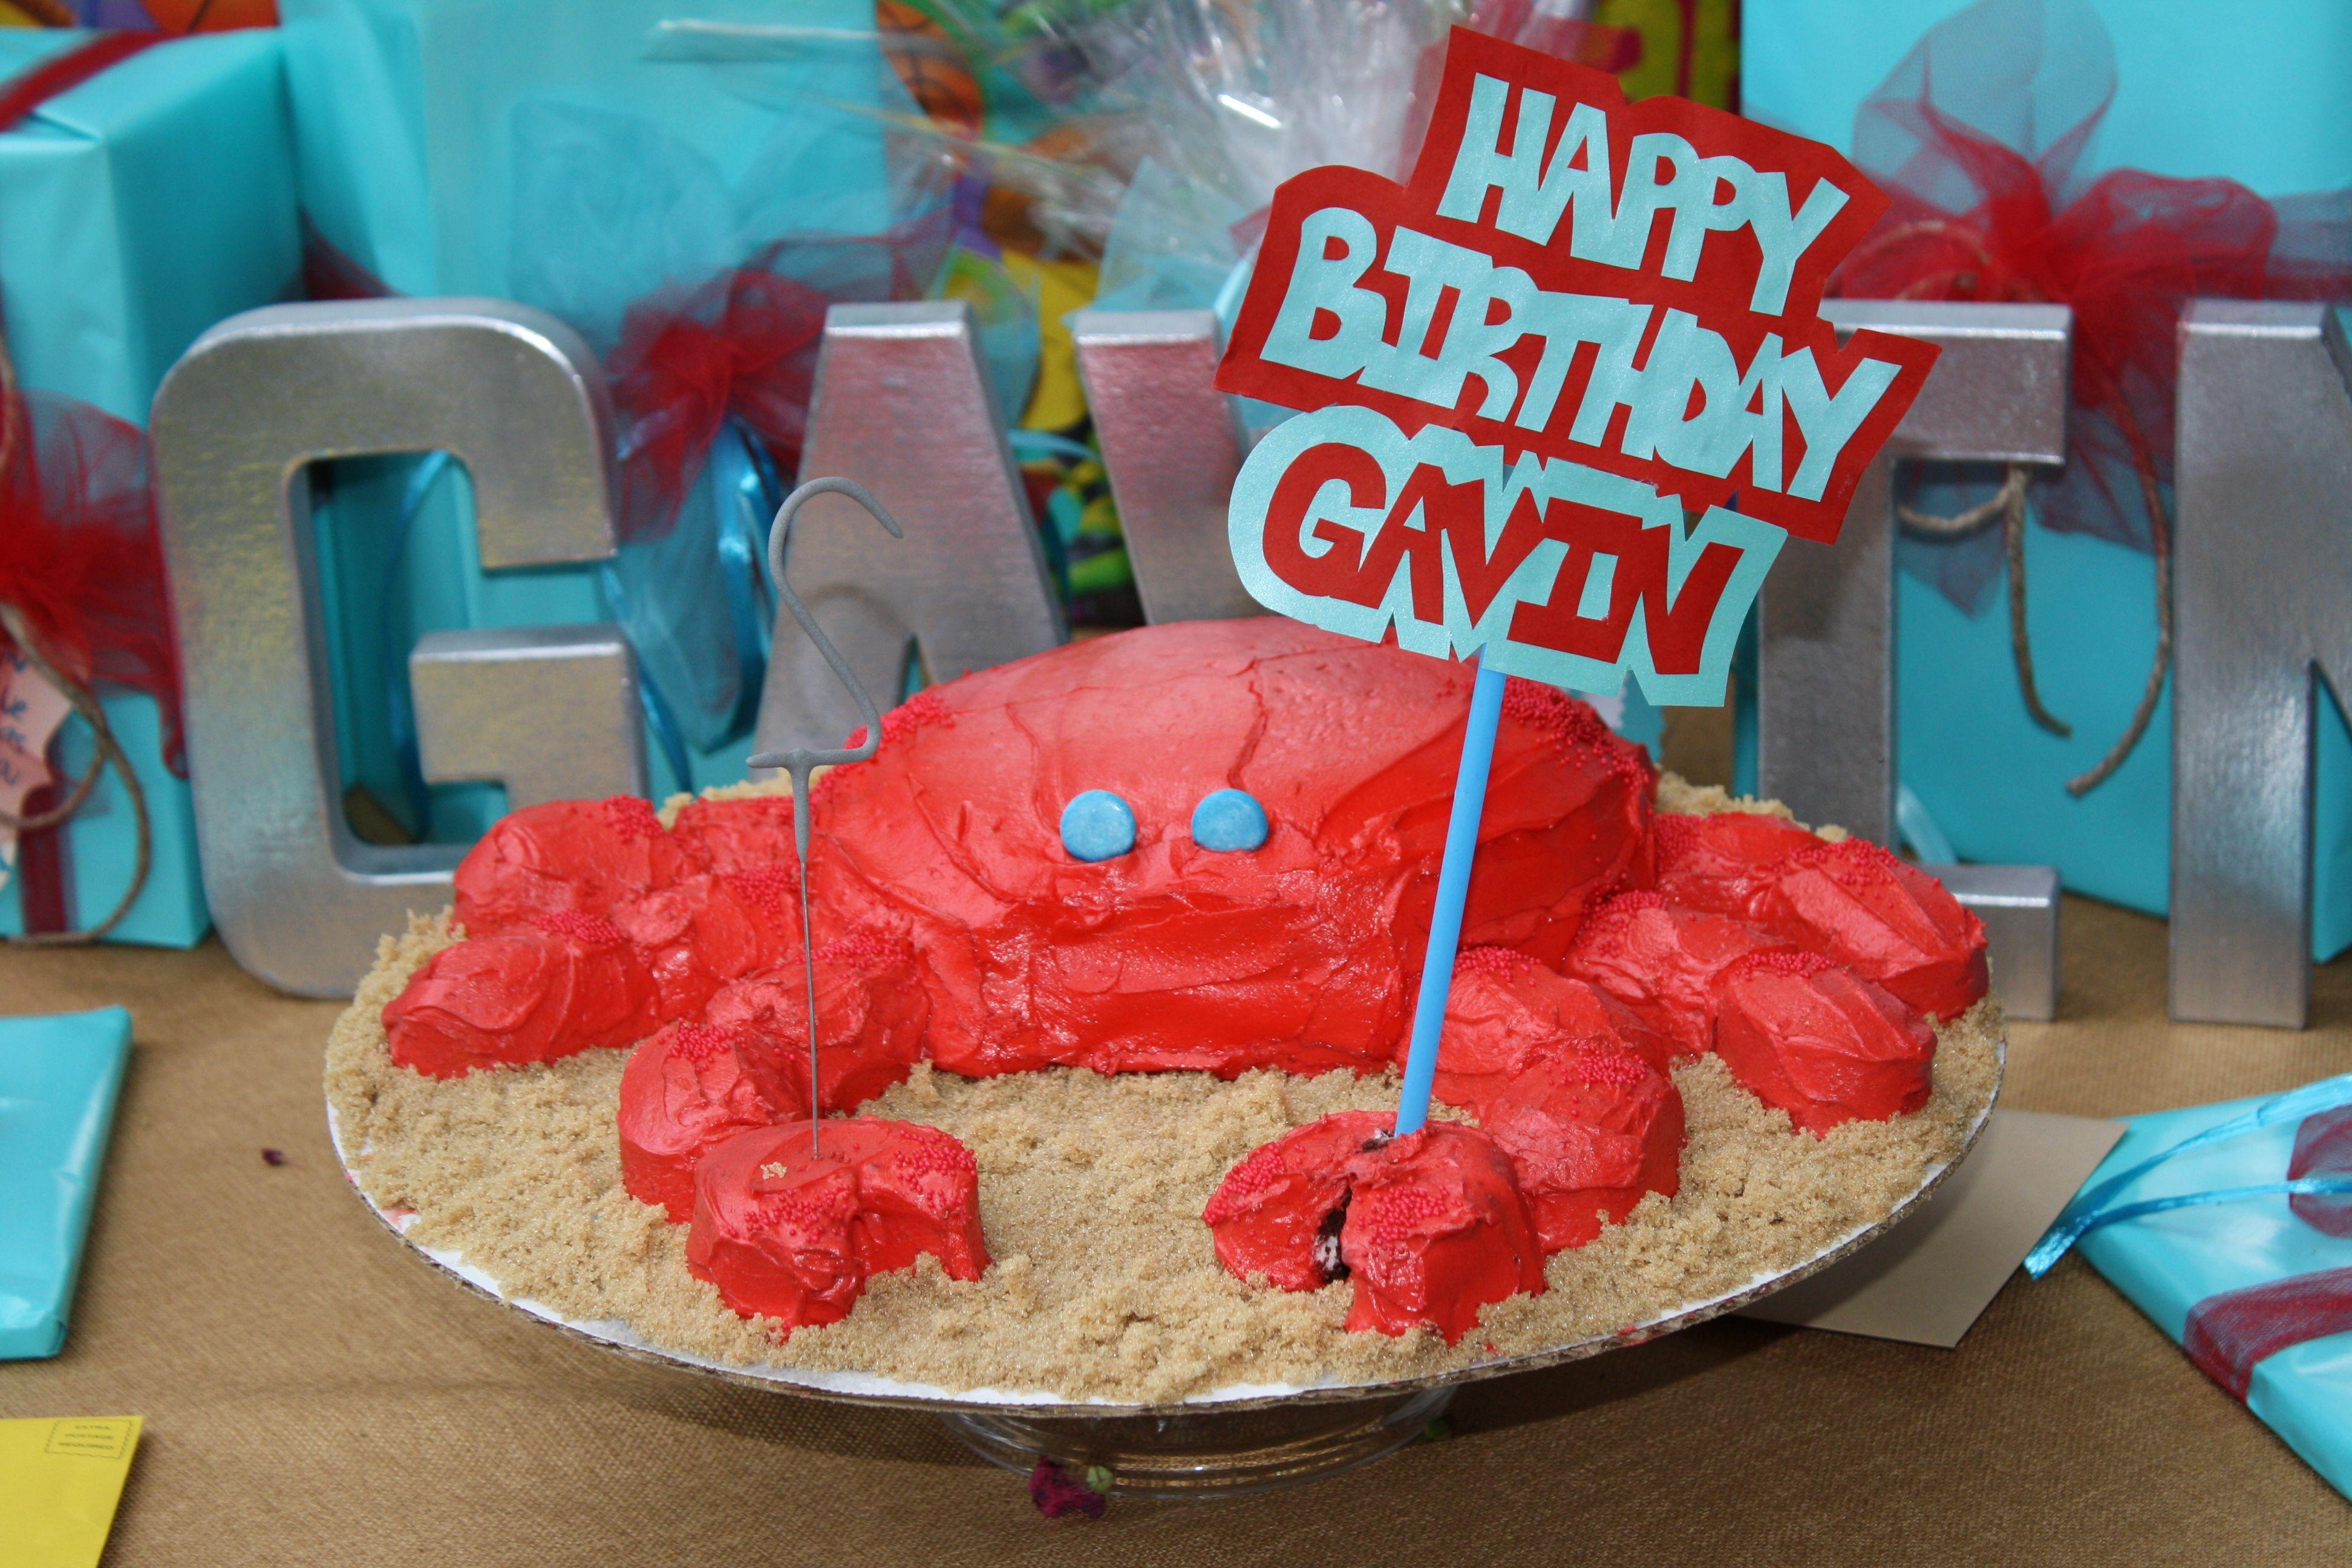 Wondrous Crab Birthday Party Cake Crab Birthday Cakes Party Cakes Crab Funny Birthday Cards Online Necthendildamsfinfo